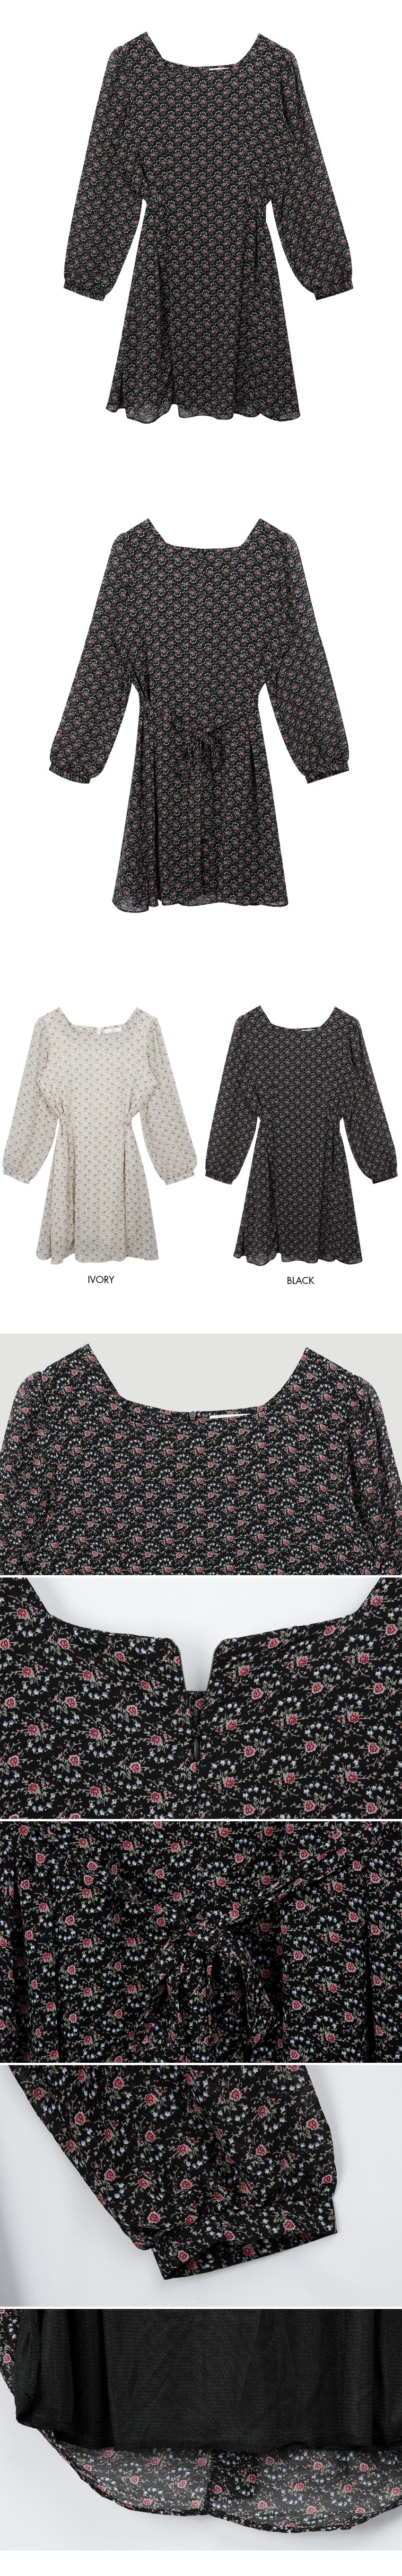 Rose Square Dress